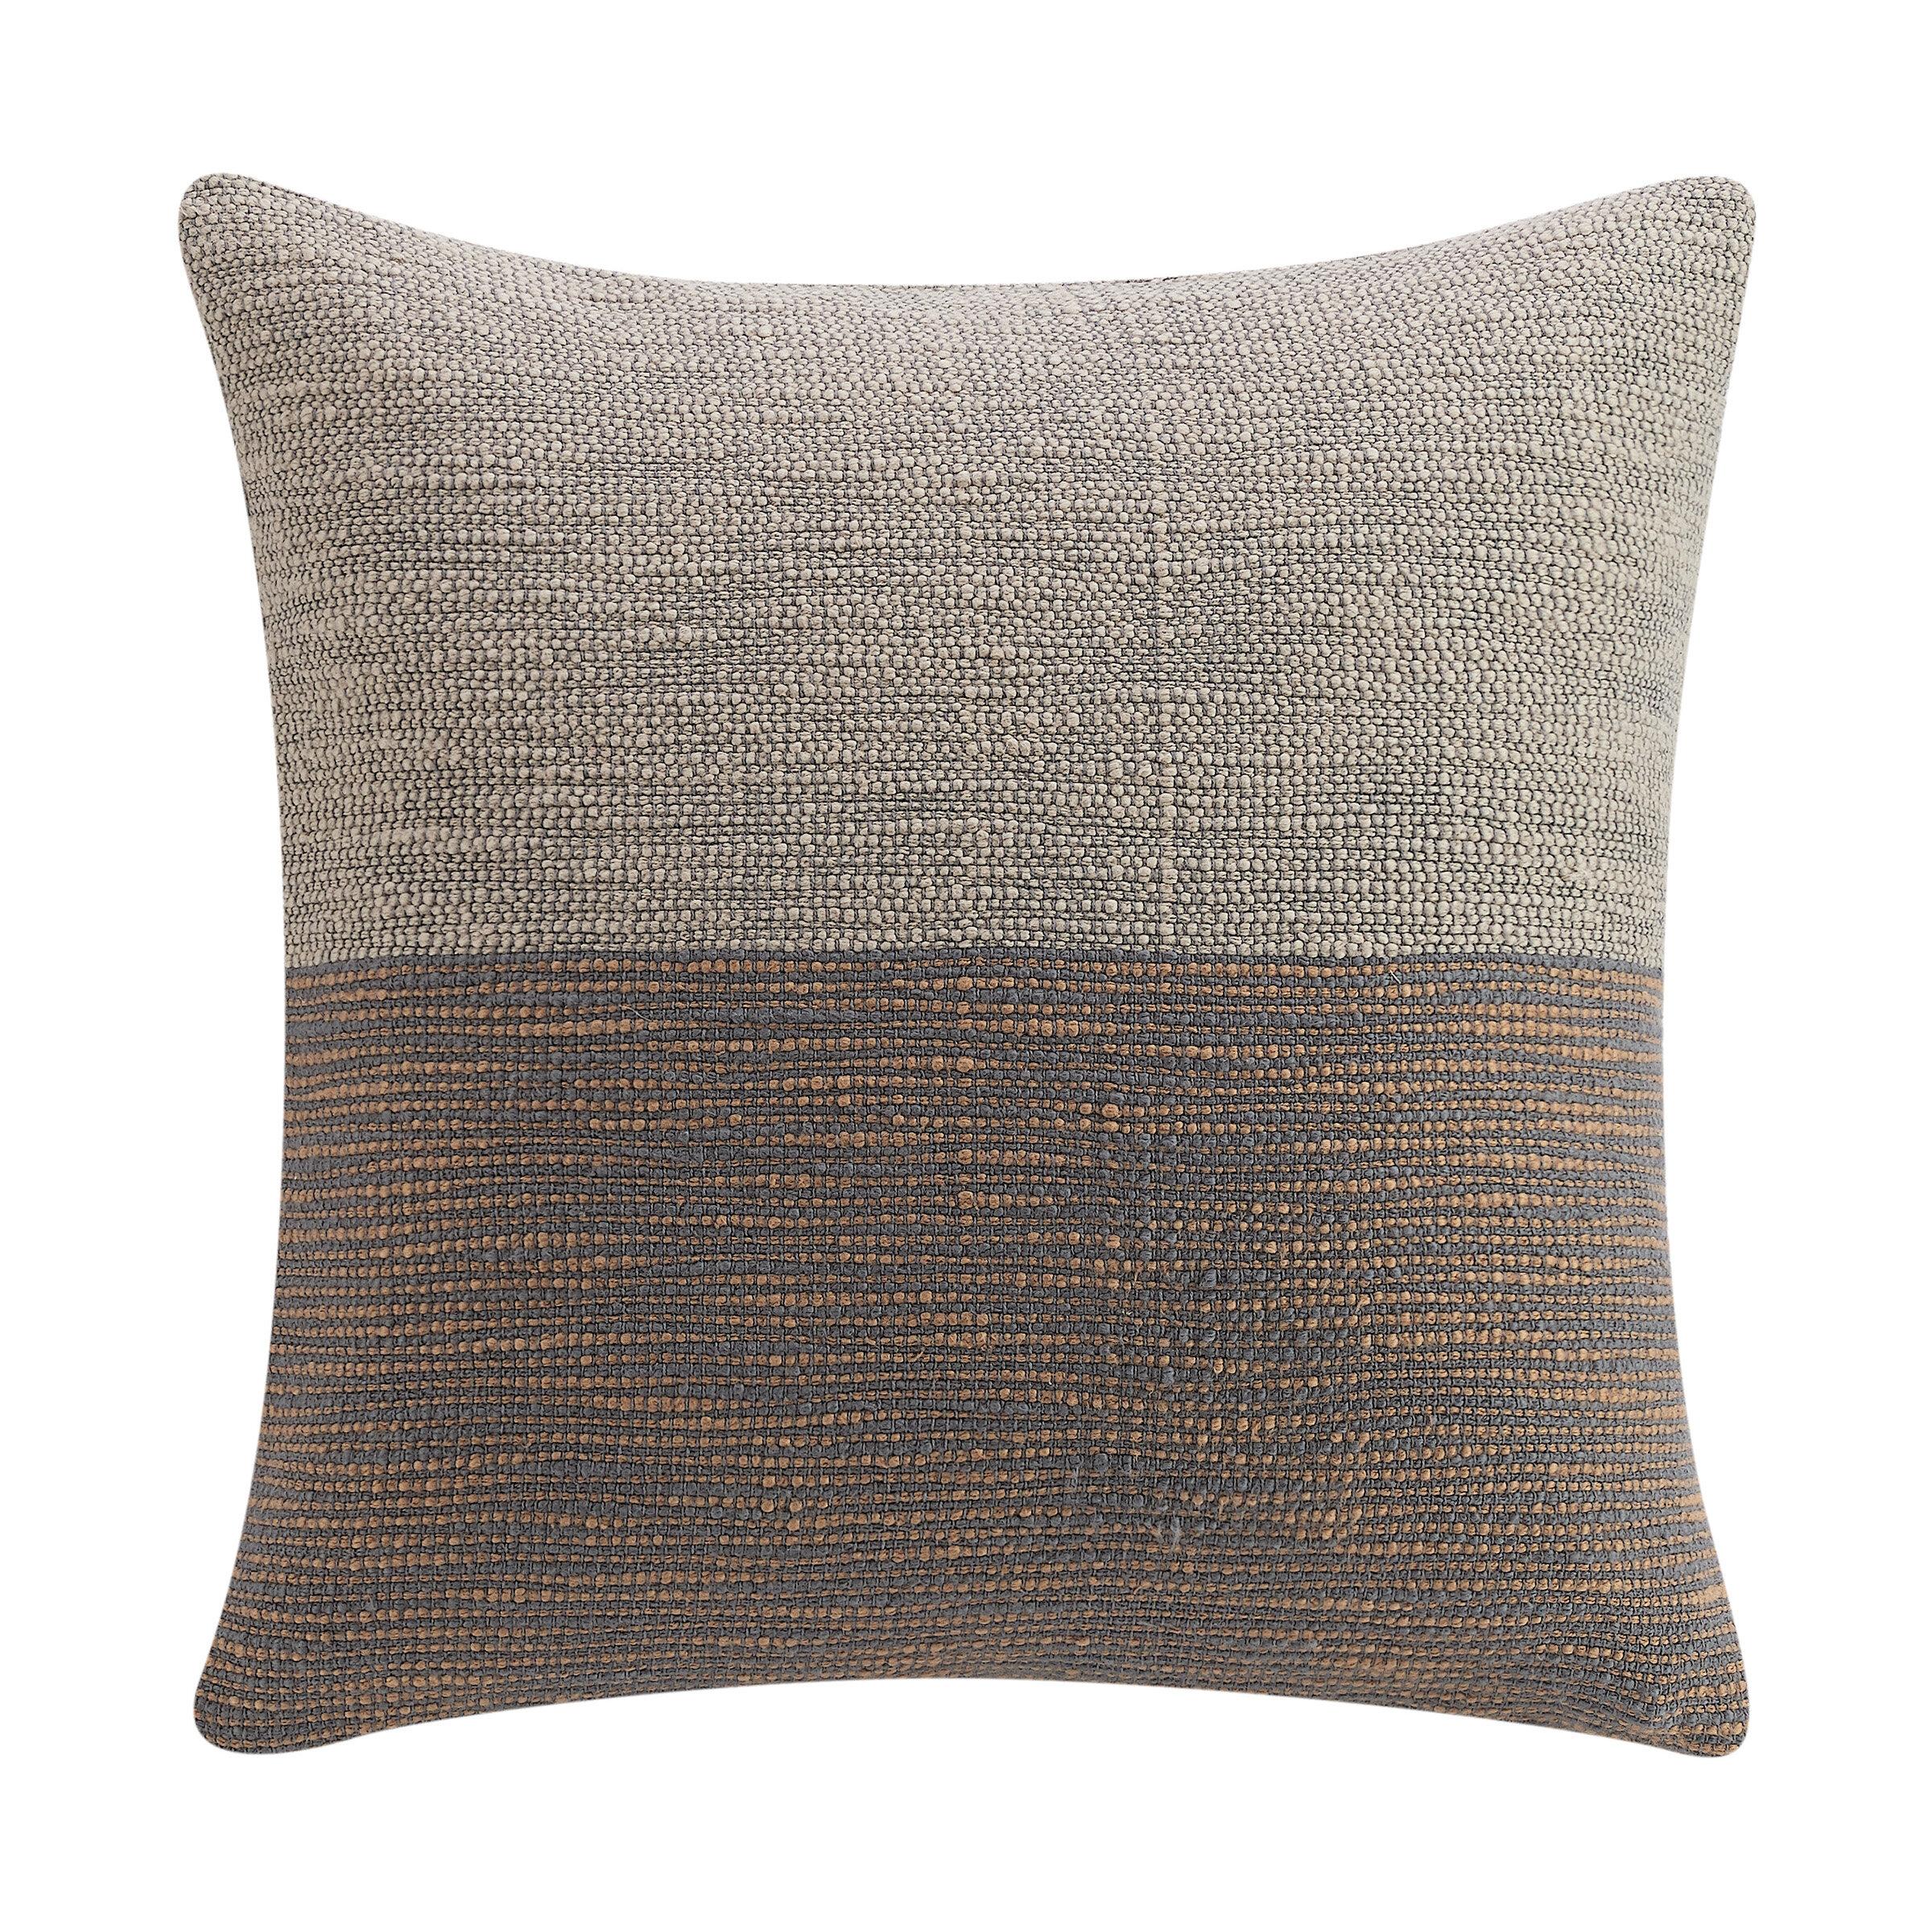 Highlinebeddingco Habit Cotton Throw Pillow Wayfair